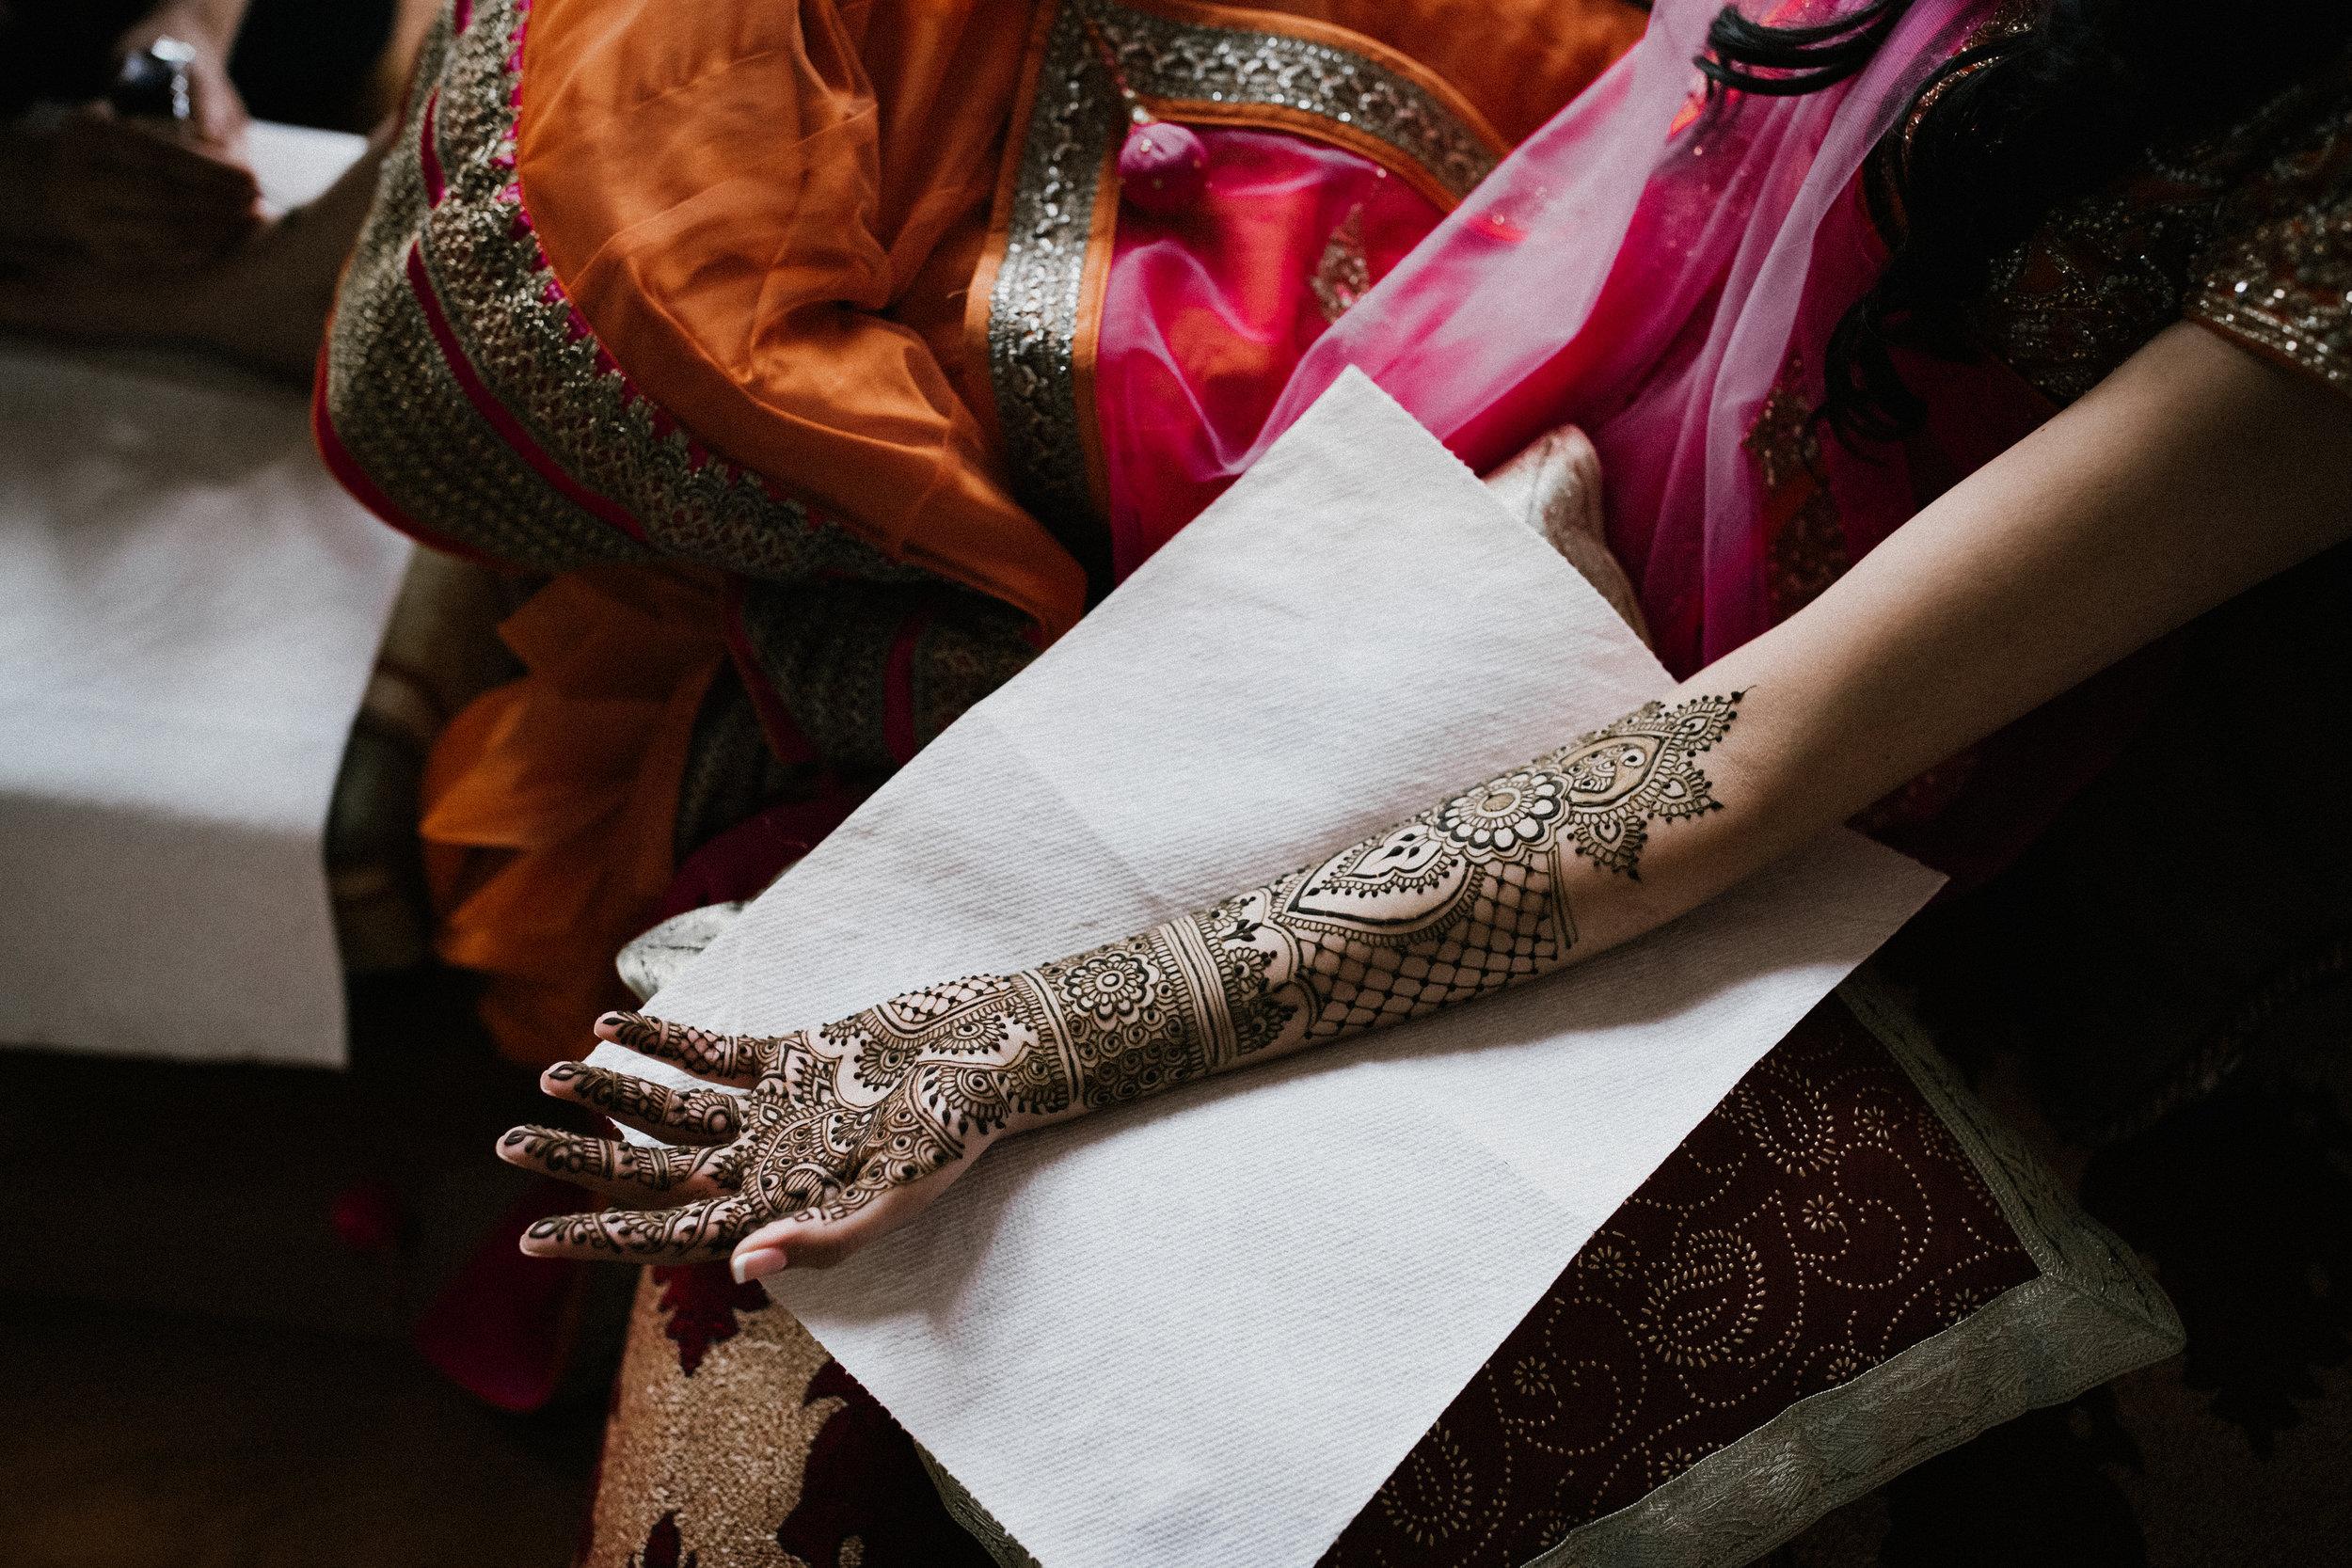 Aparna-Ankit-Patel-Mehndi-Wedding-Photos-0001.jpg